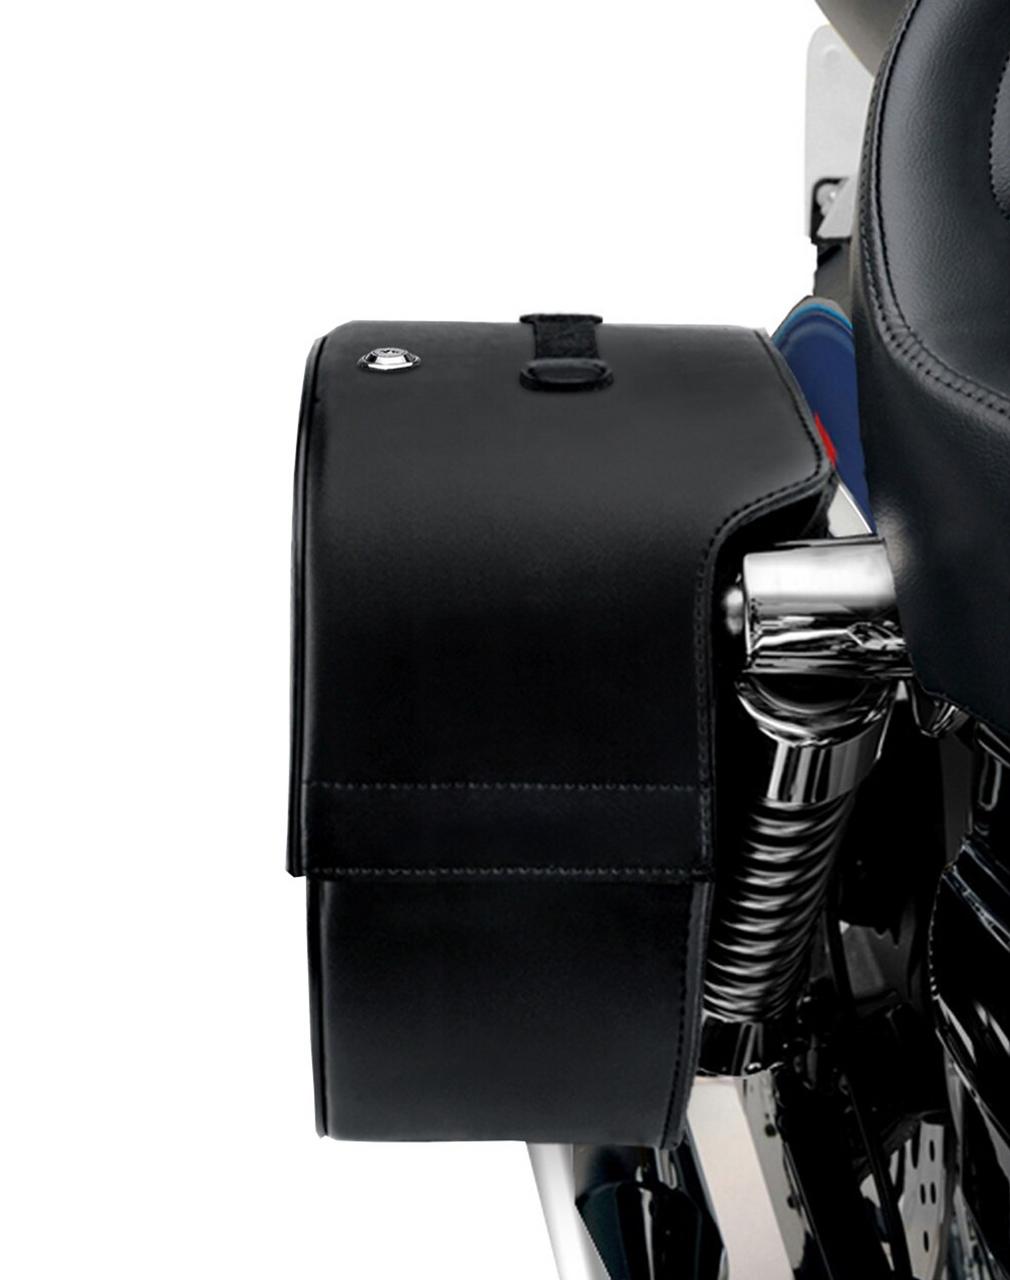 Indian Chief Standard Viking Armor Shock Cutout Motorcycle Saddlebags Shock Cutout View